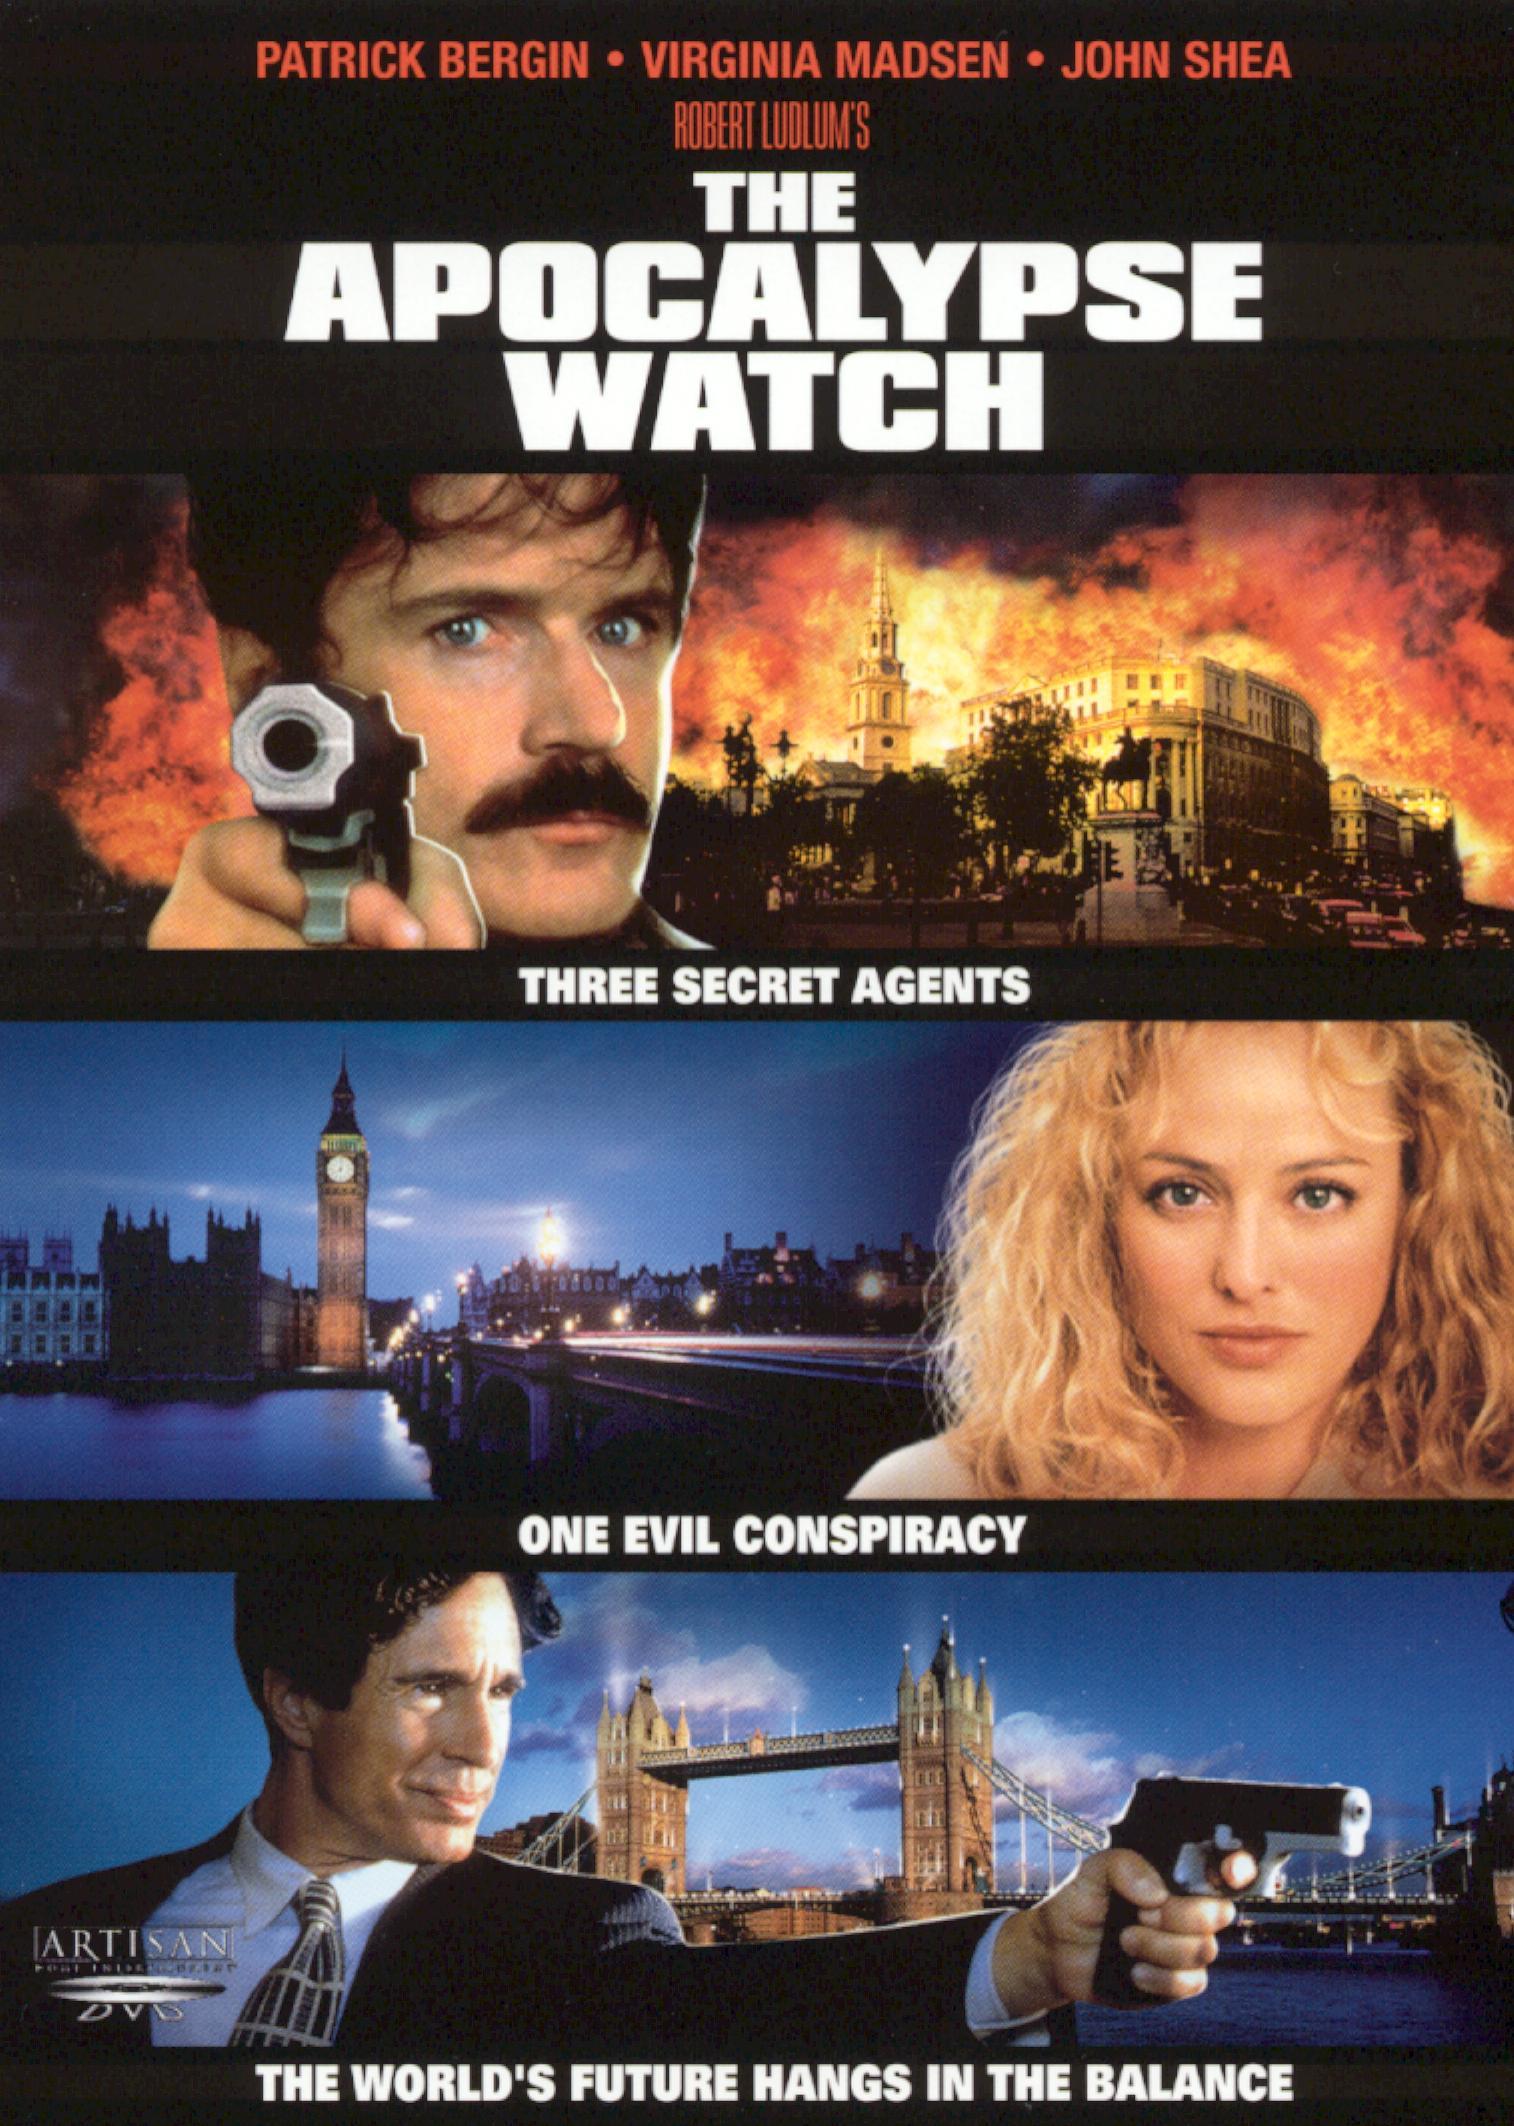 The Apocalypse Watch (1997)